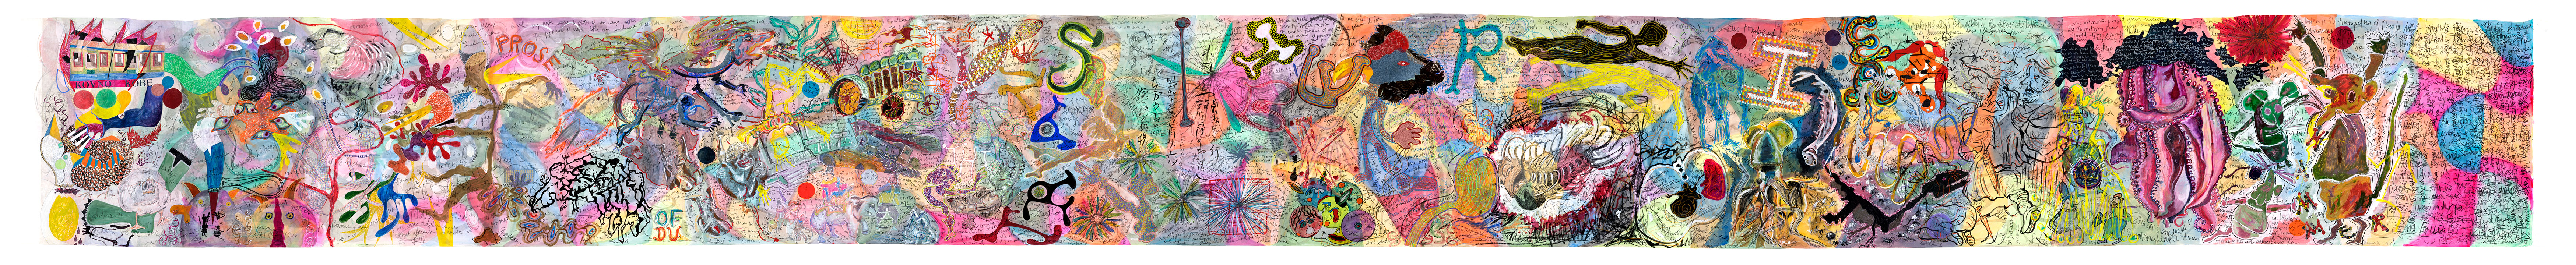 KOVNO/KOBE: PROSE OF THE TRANS-SIBERIAN, 2019. Técnica mixta sobre papel. 110 x 1170 cm. JH-0028